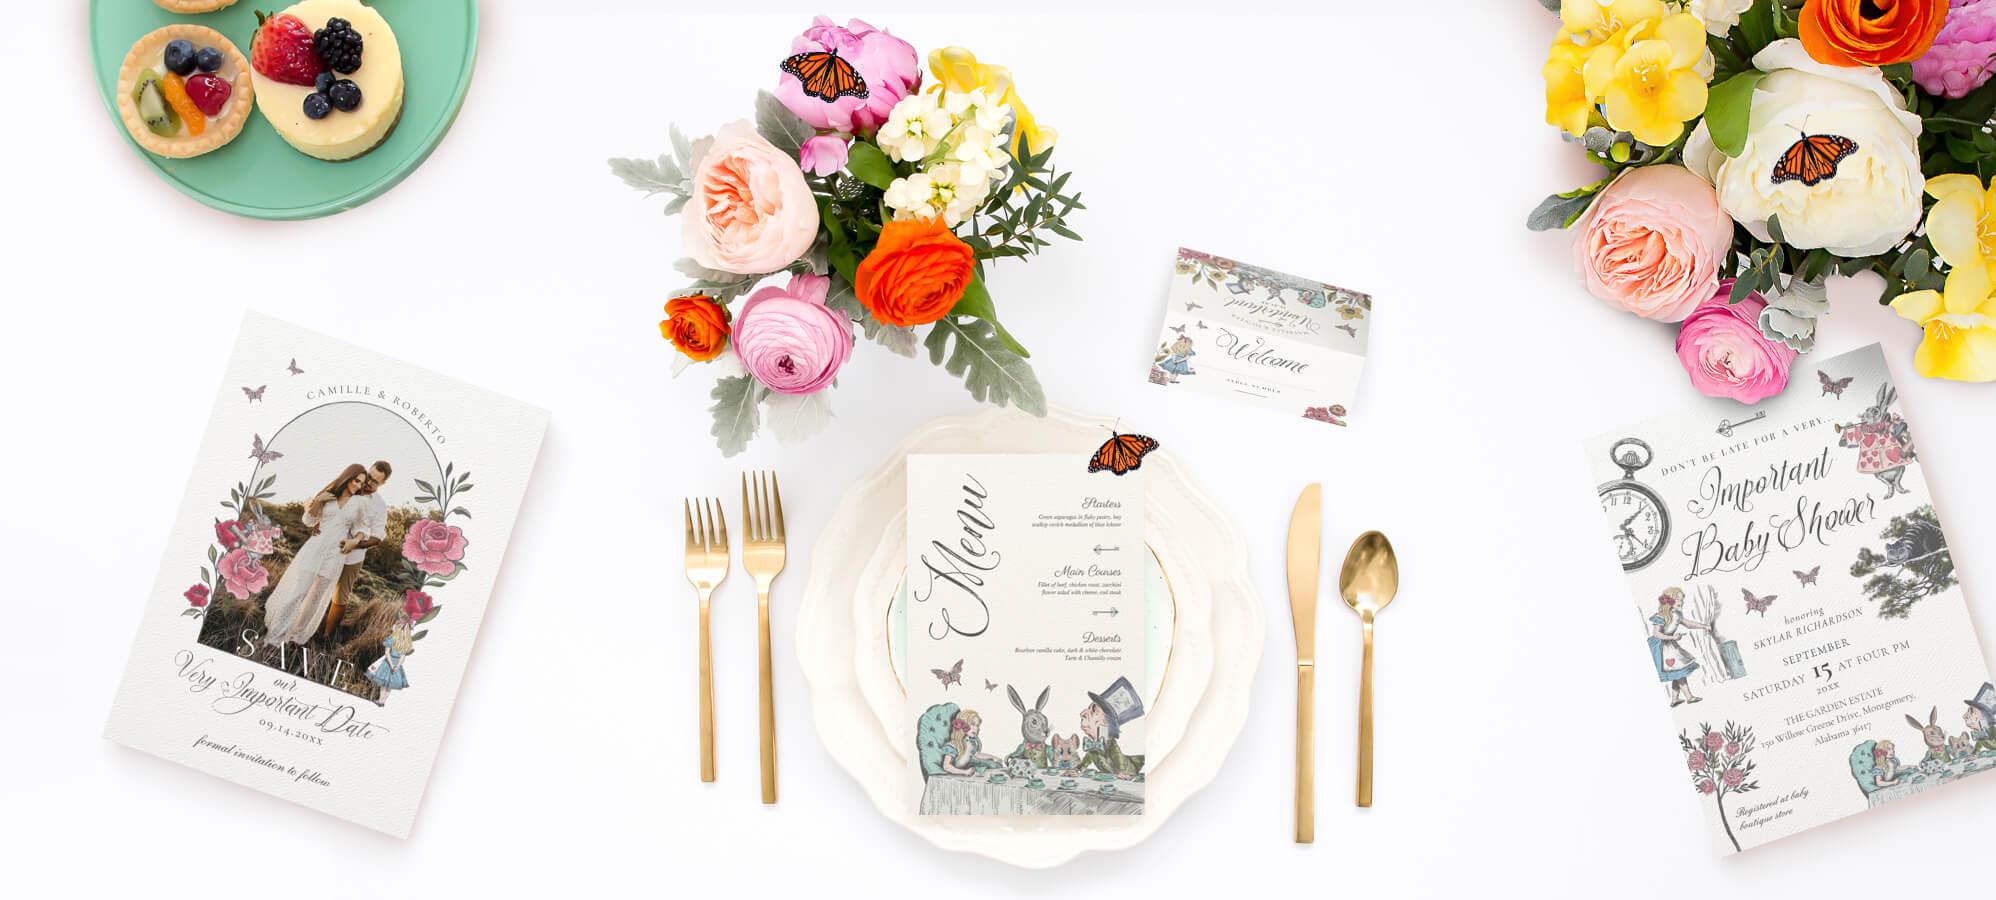 Vintage Alice in Wonderland Wedding Invitations By Moodthology Papery